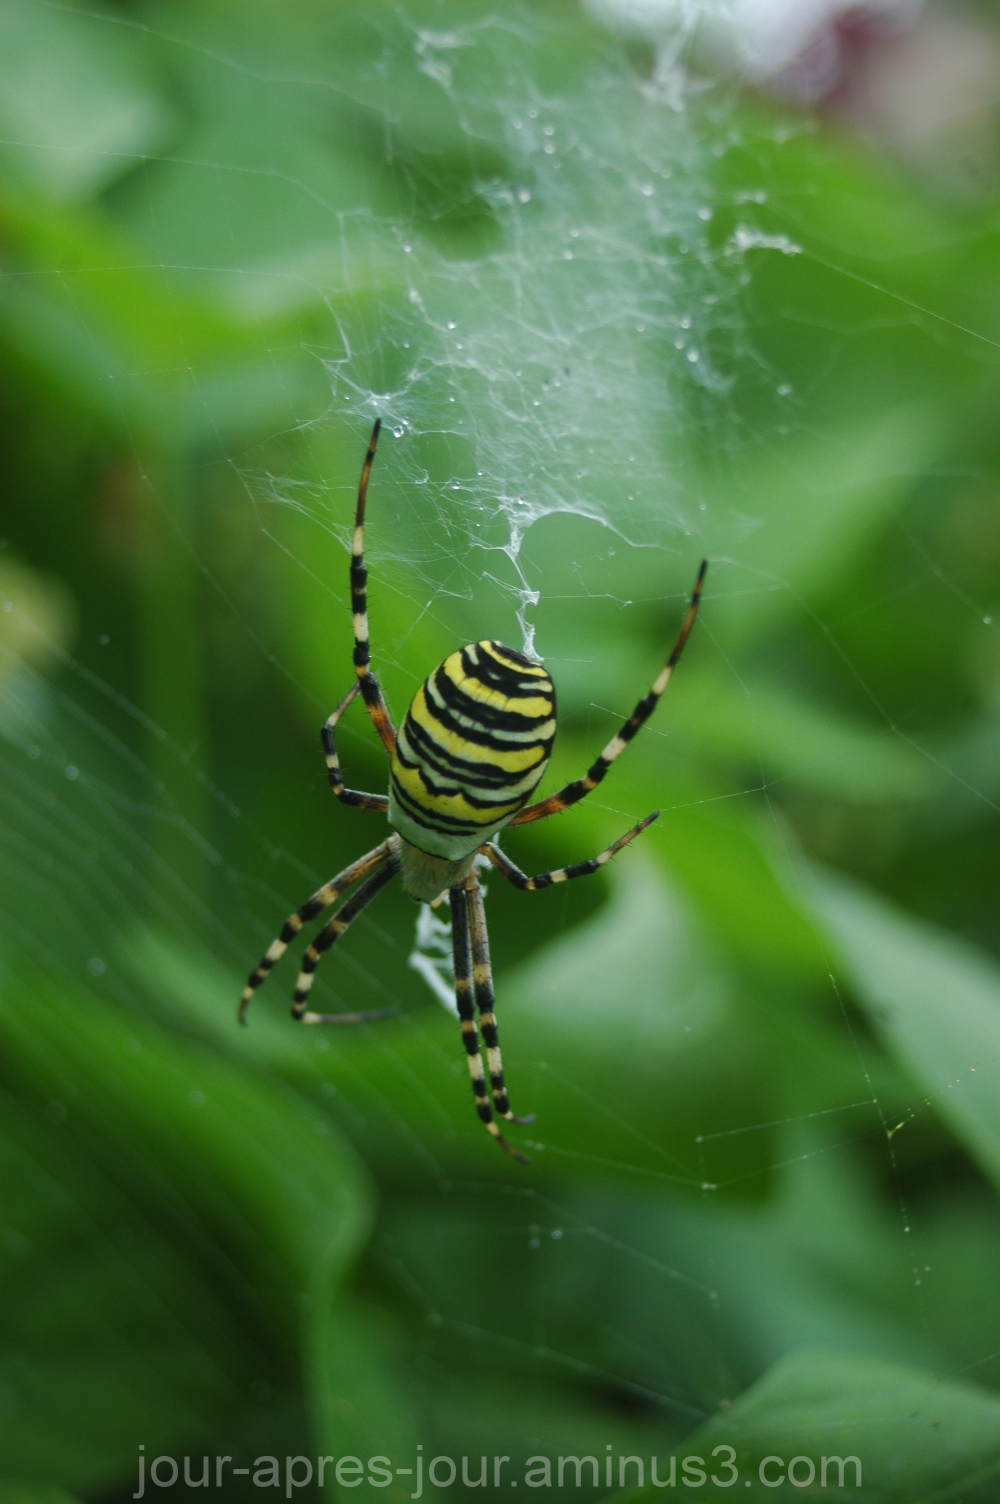 une jolie araignée au plafond....